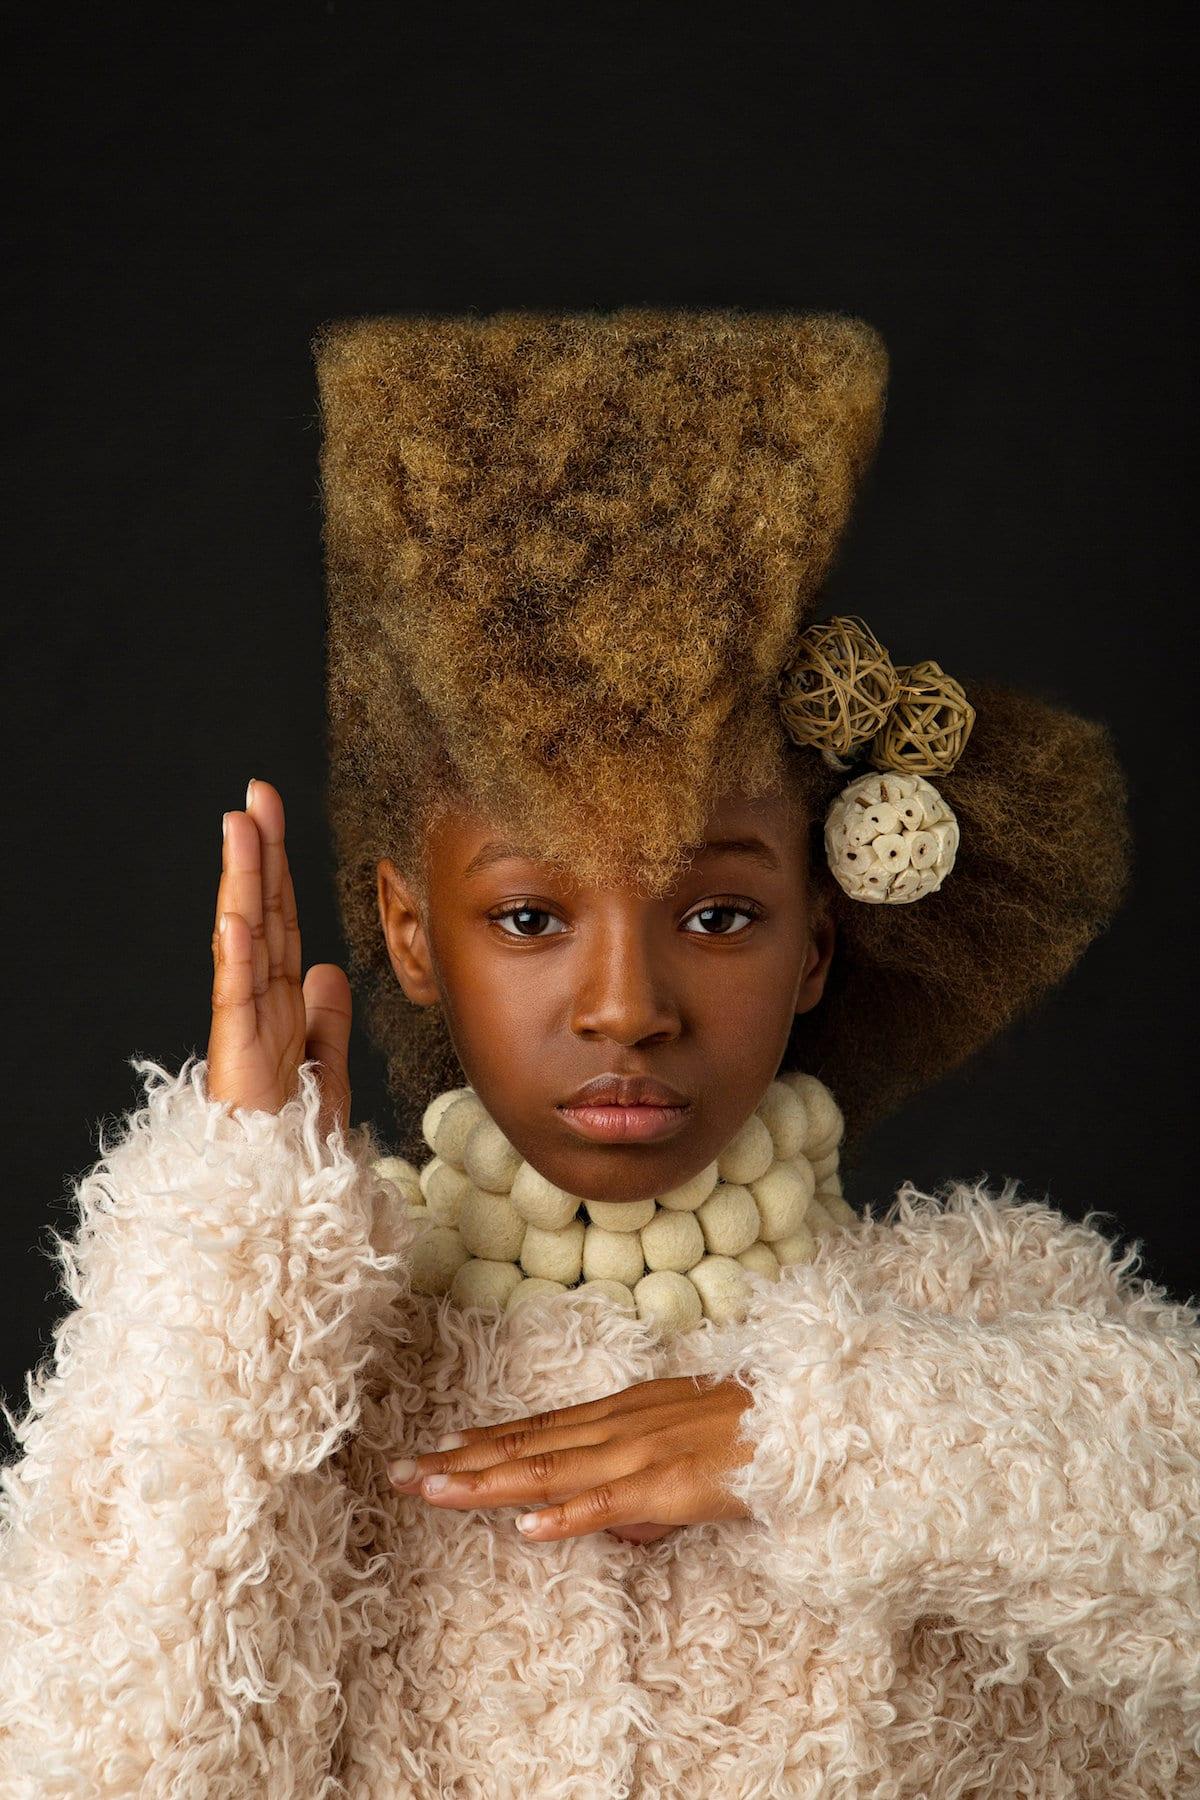 Afro-art-creative-soul-photography-2.jpg